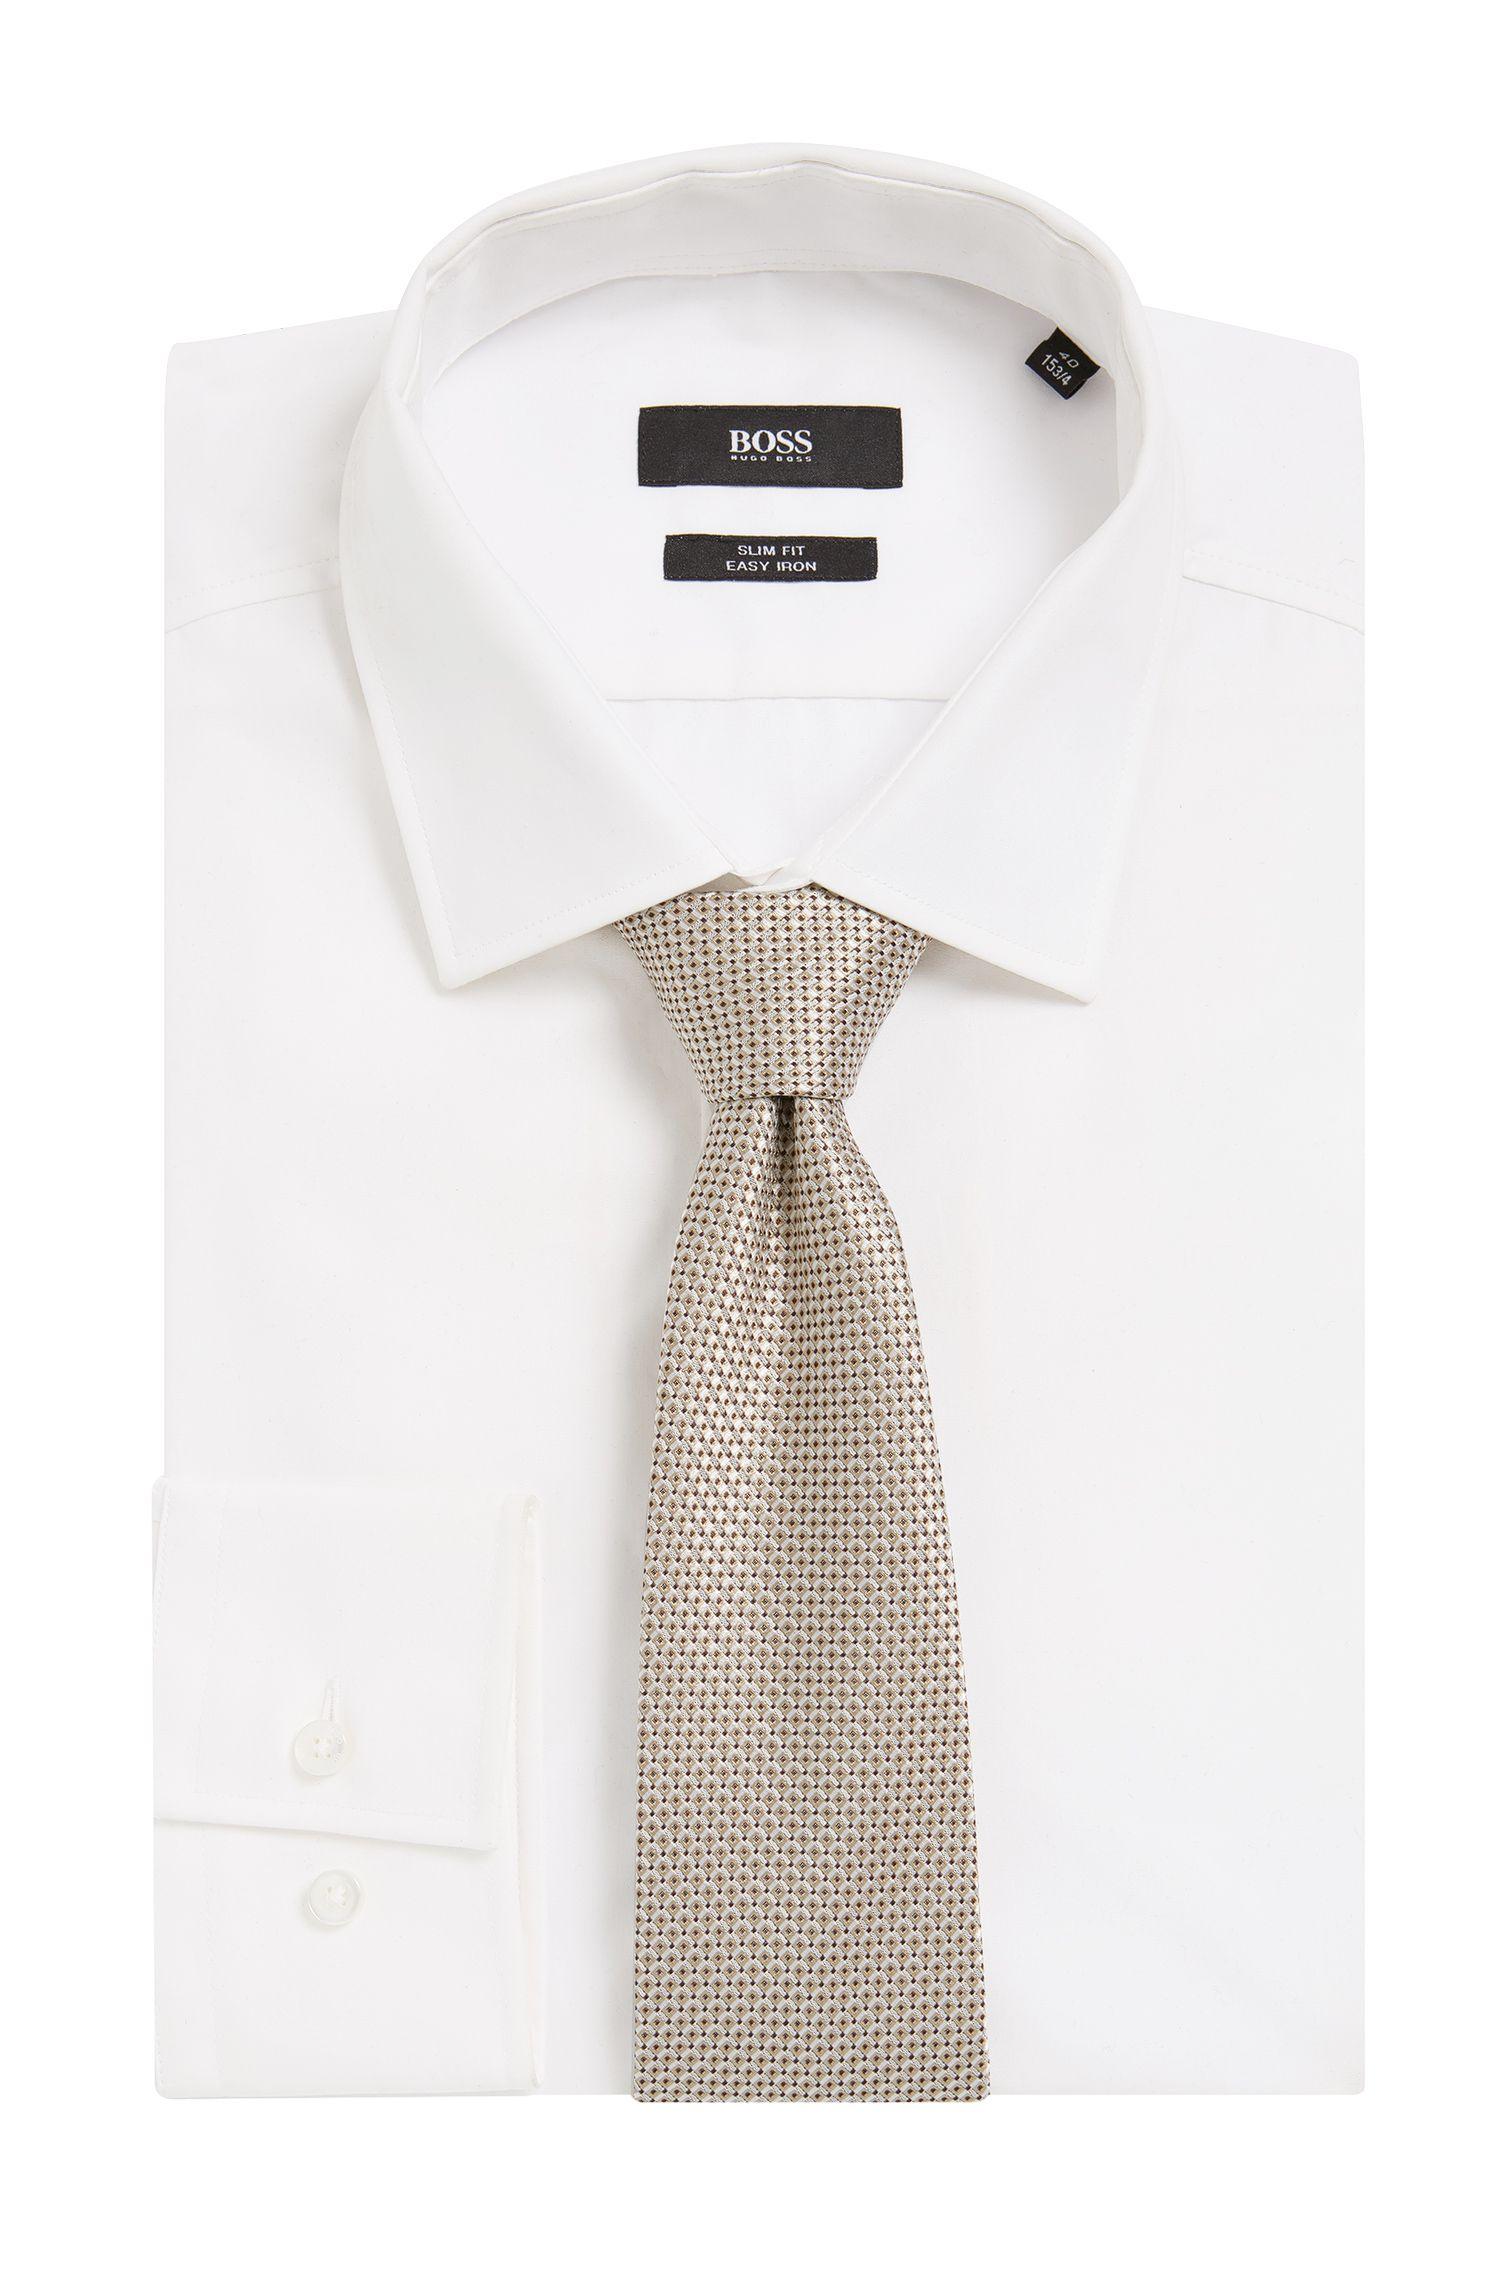 BOSS Tailored Italian Silk Jacquard Tie, Natural